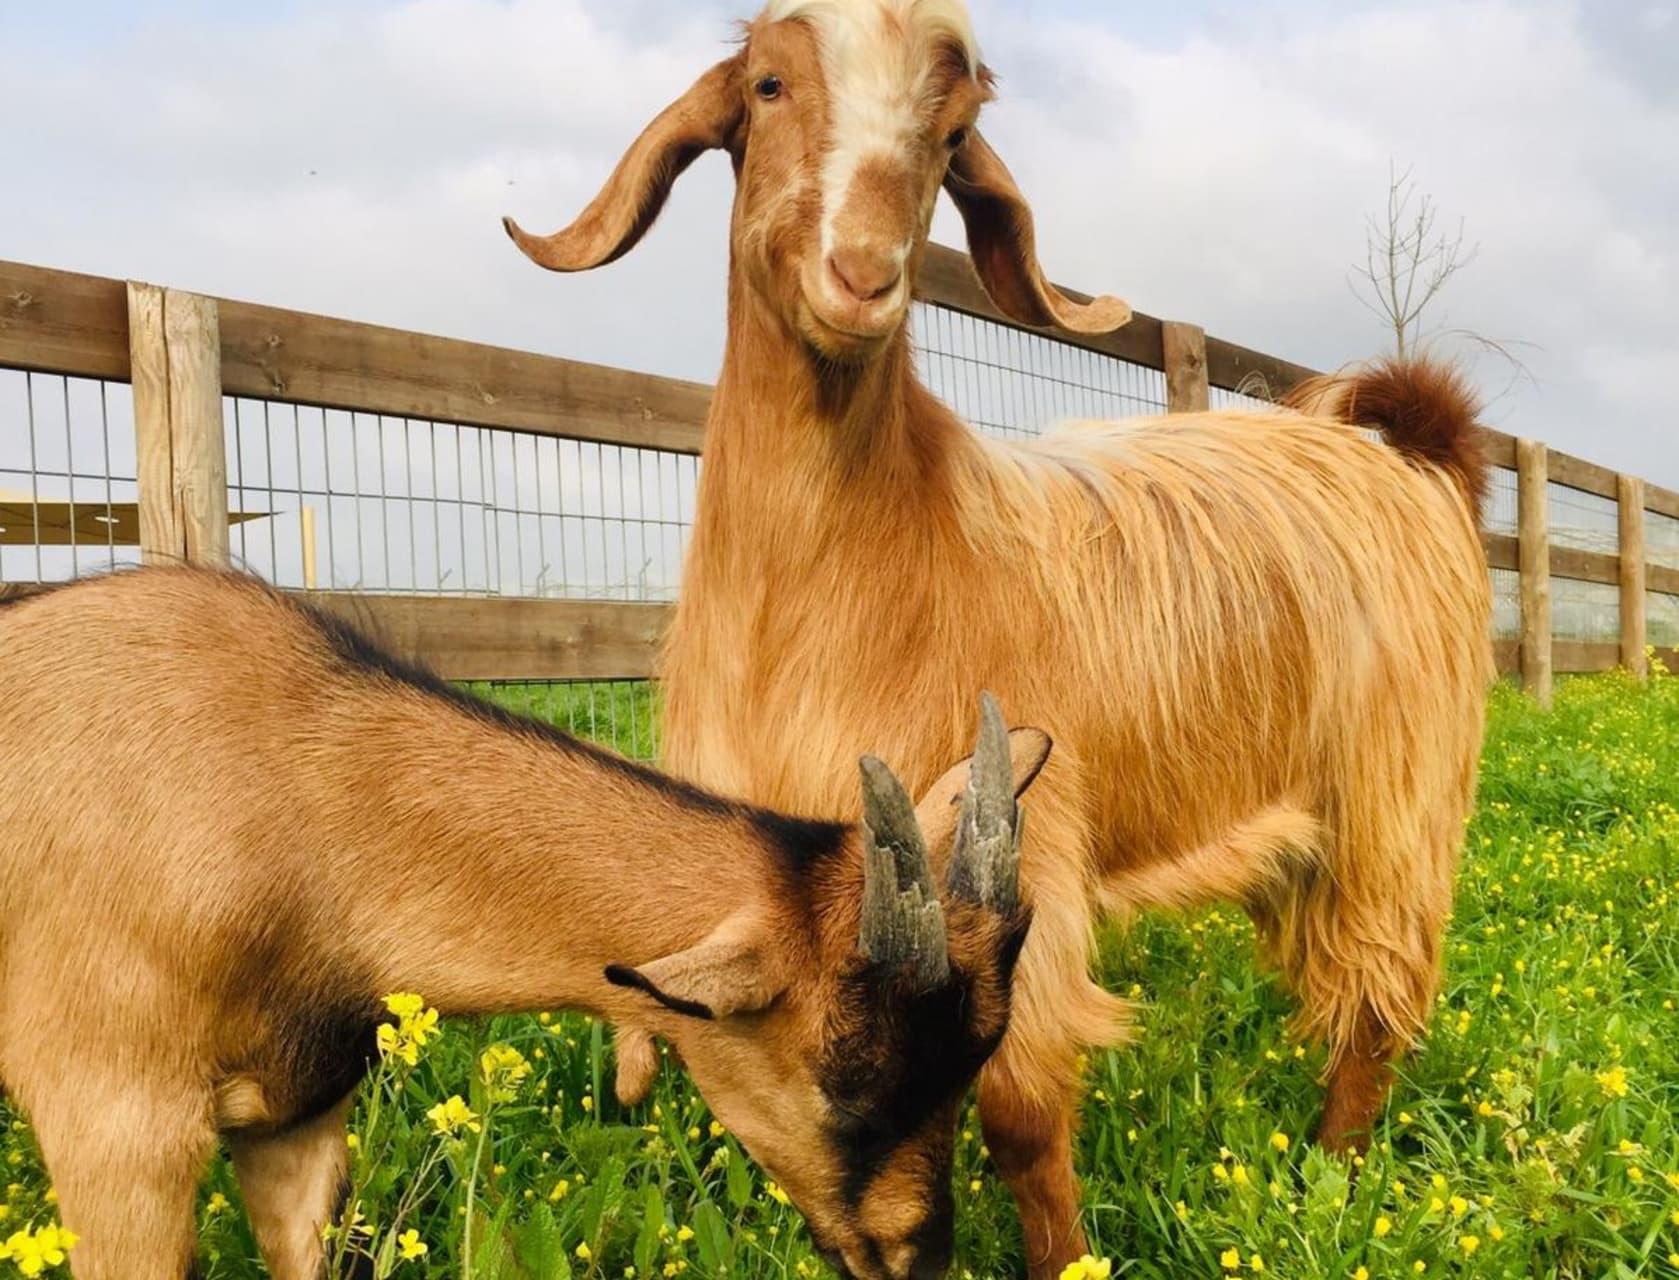 Olesh - Meet the Animals at Freedom Farm Sanctuary - Part 1